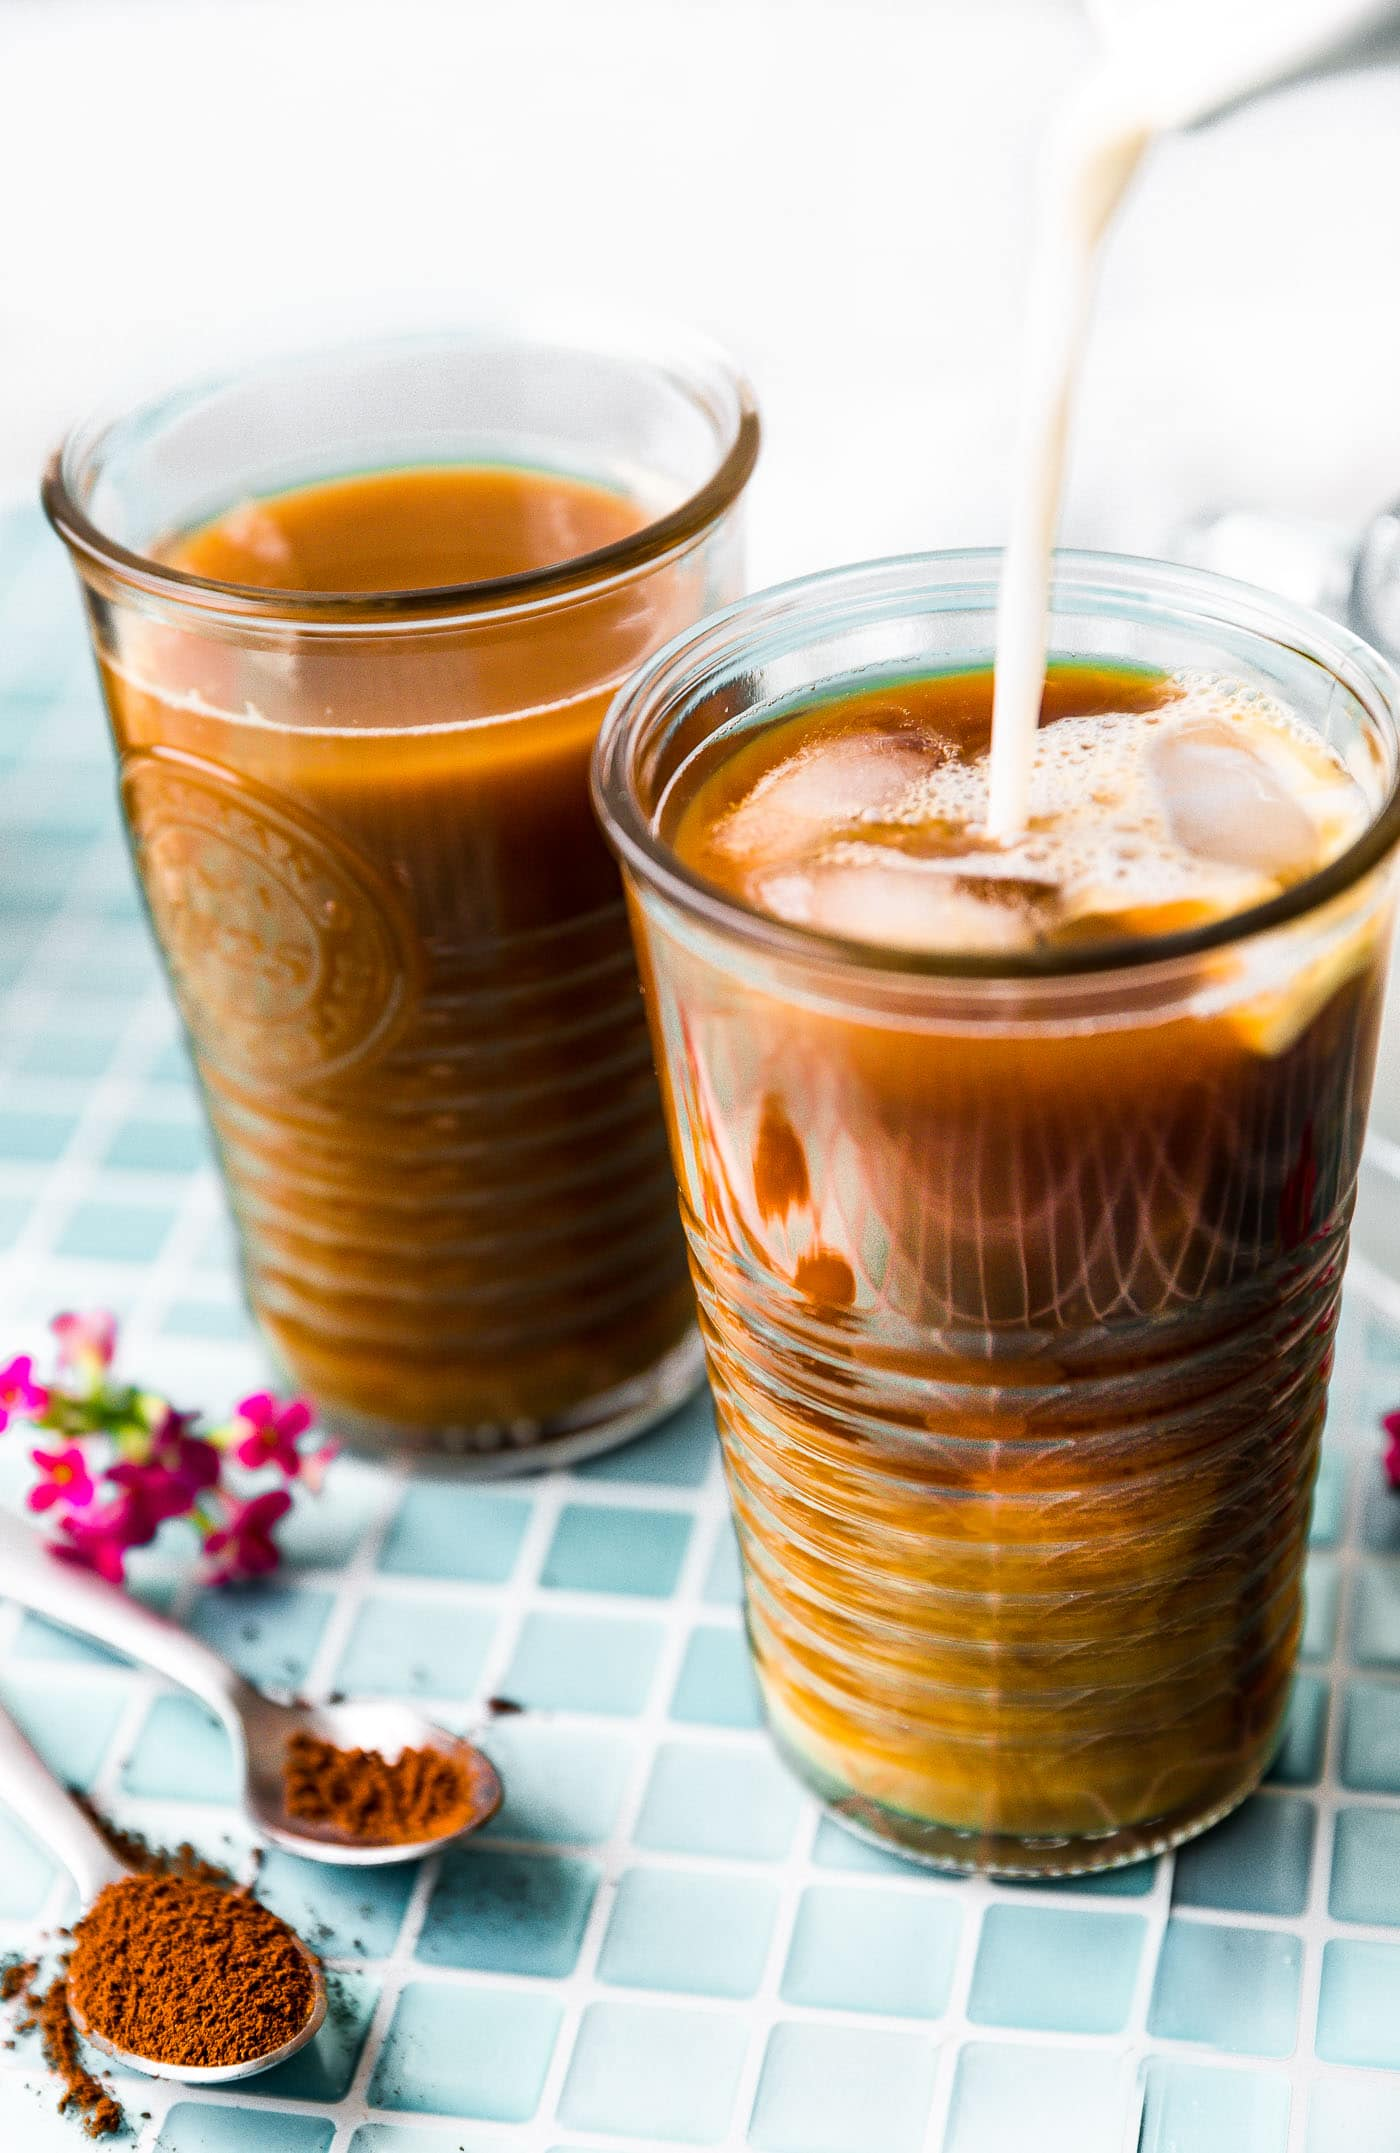 vegan latte - iced